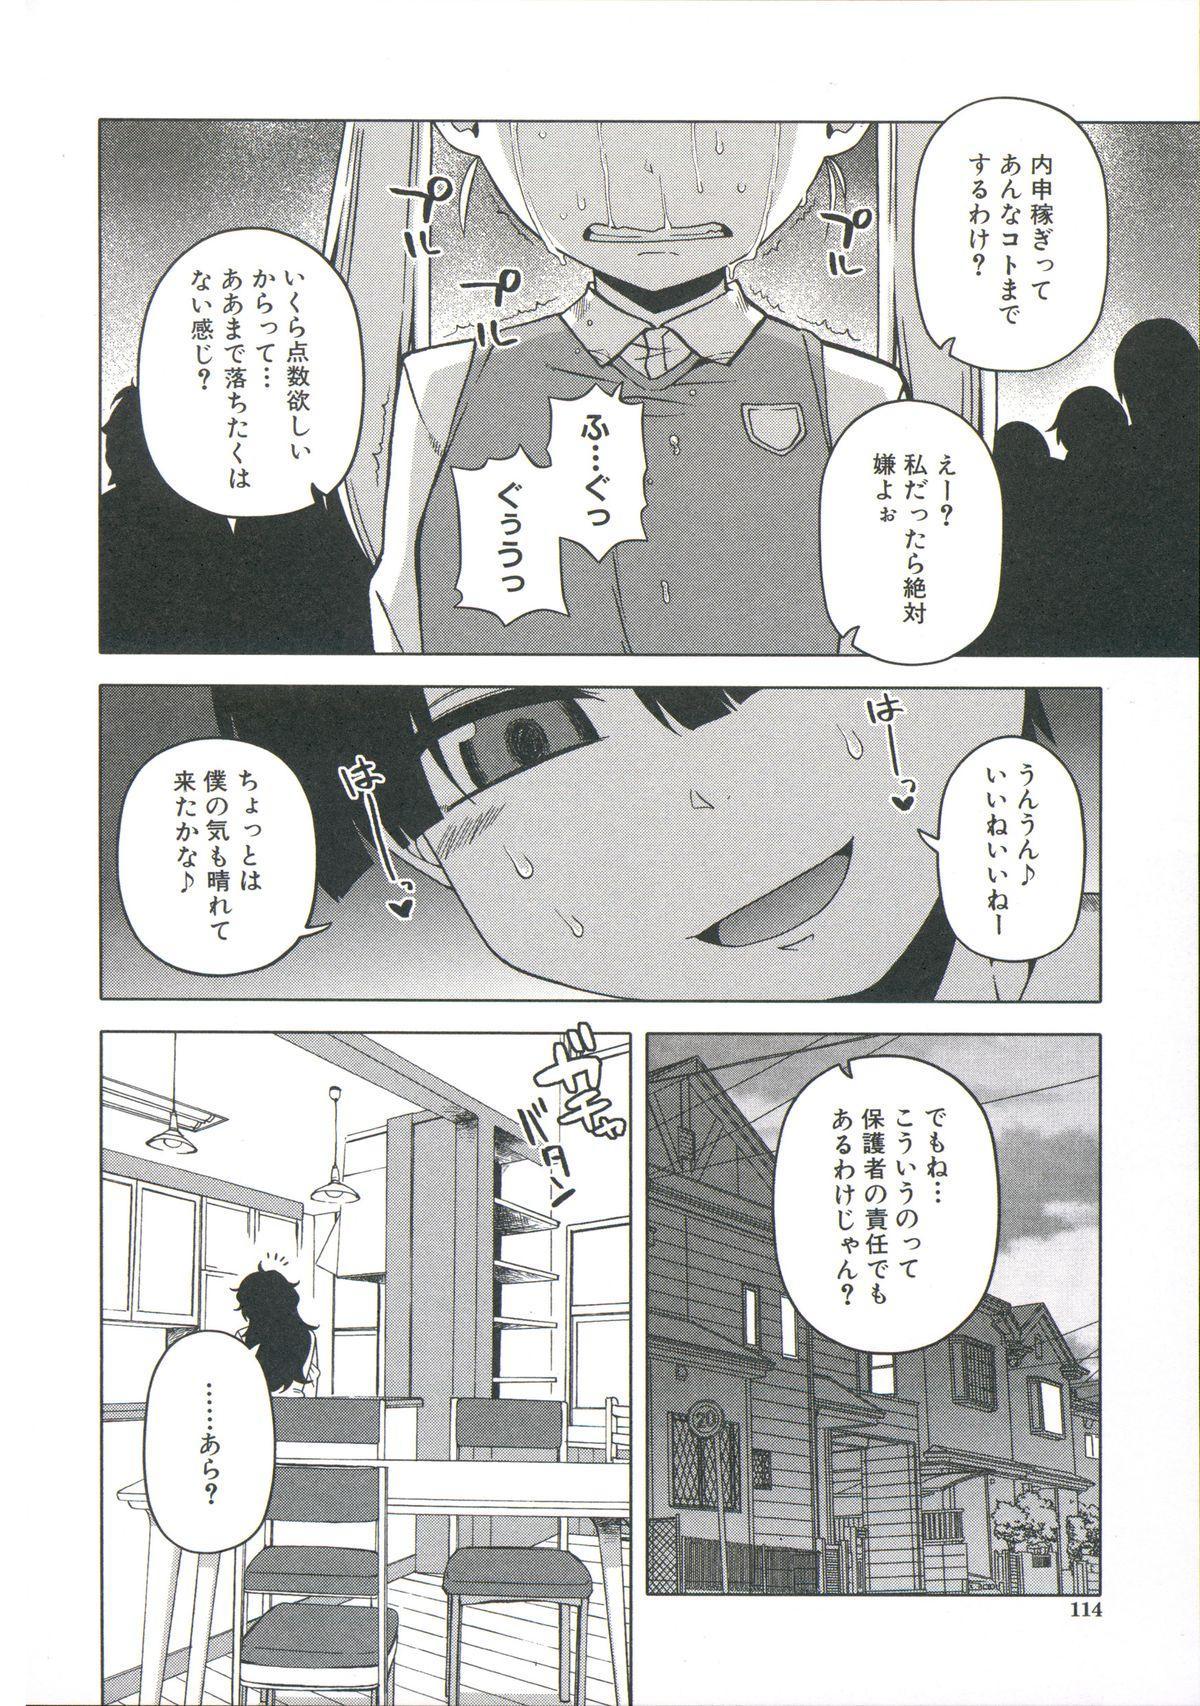 [Takatsu] Ou-sama Appli - King App 116